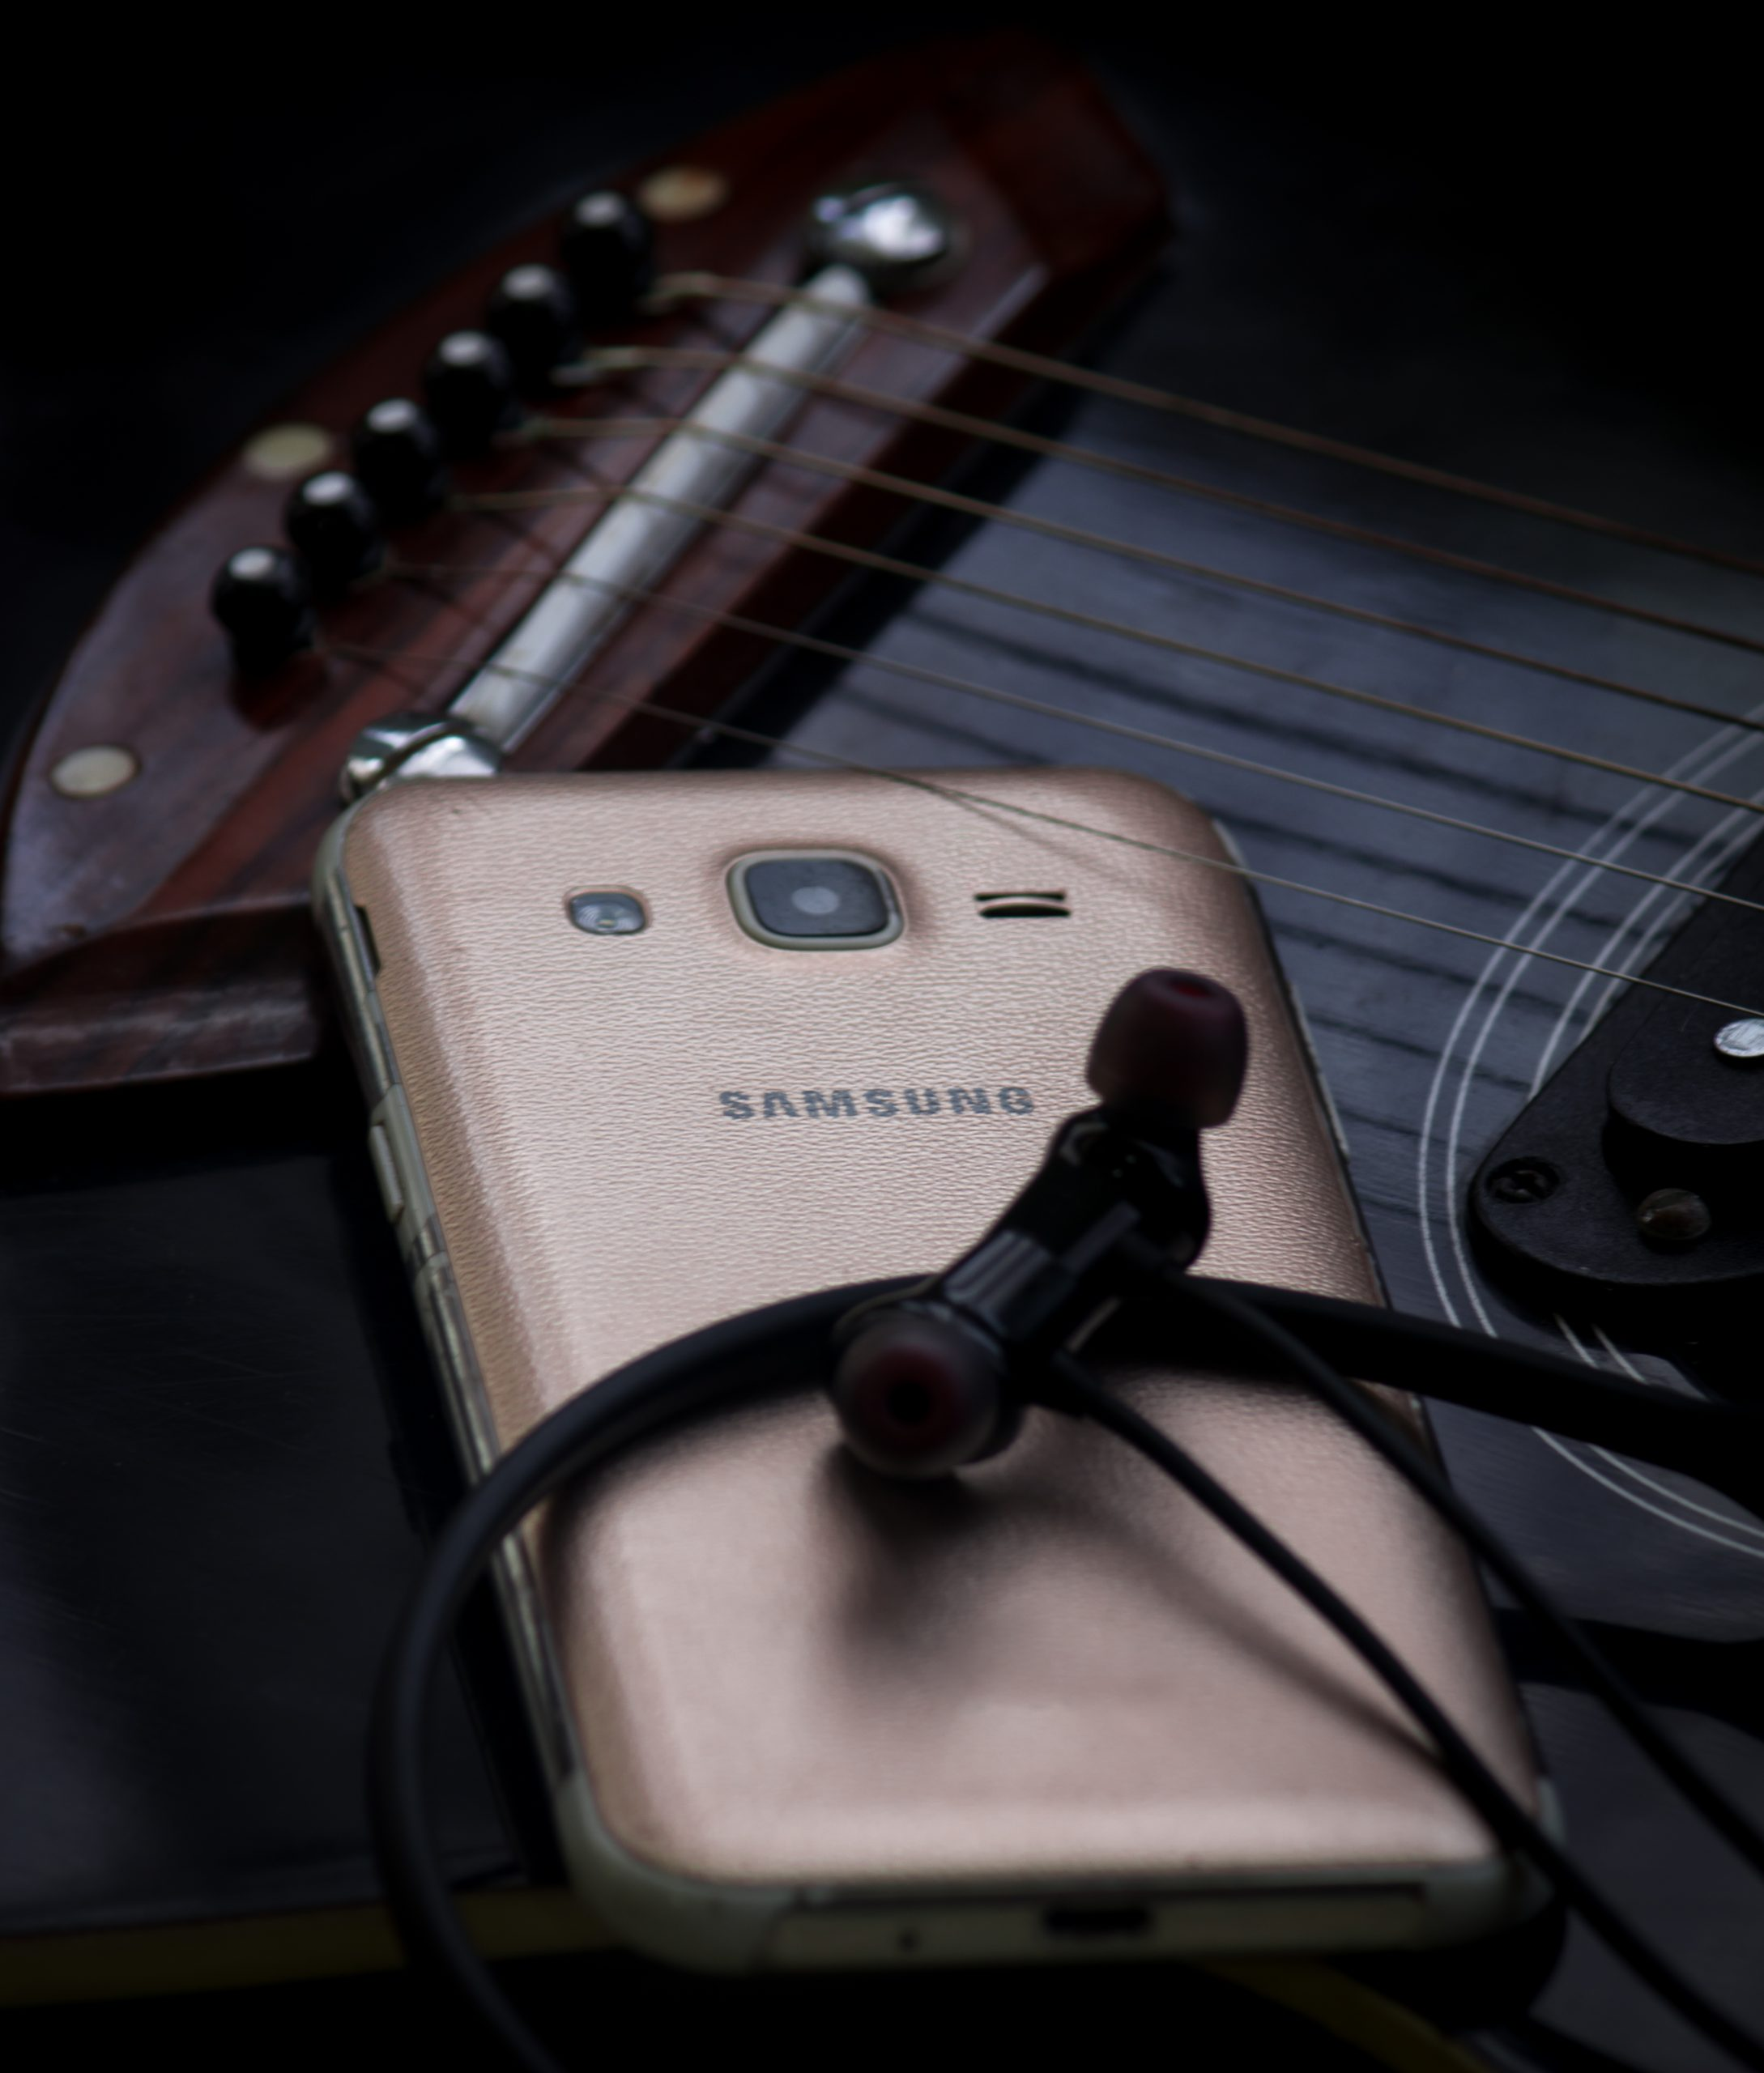 A Samsung smartphone